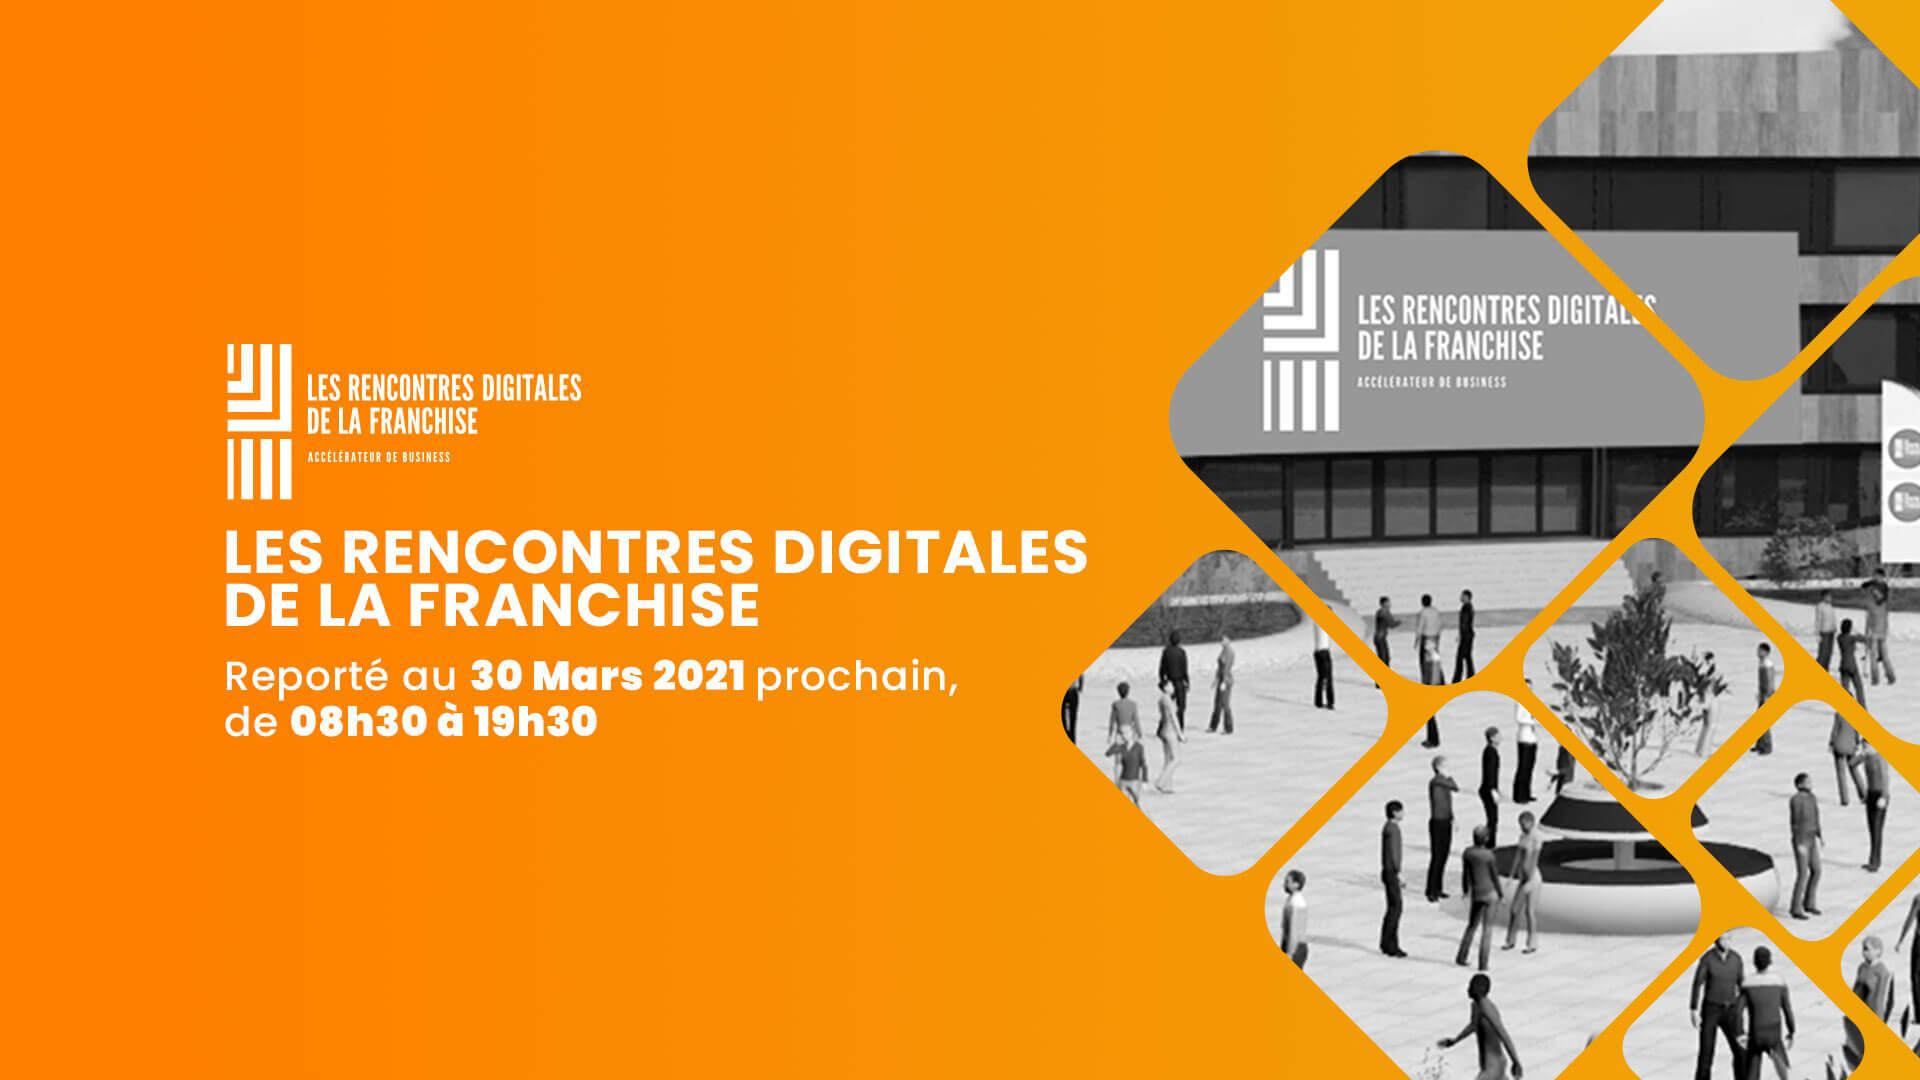 Les Rencontres Digitales de la Franchise